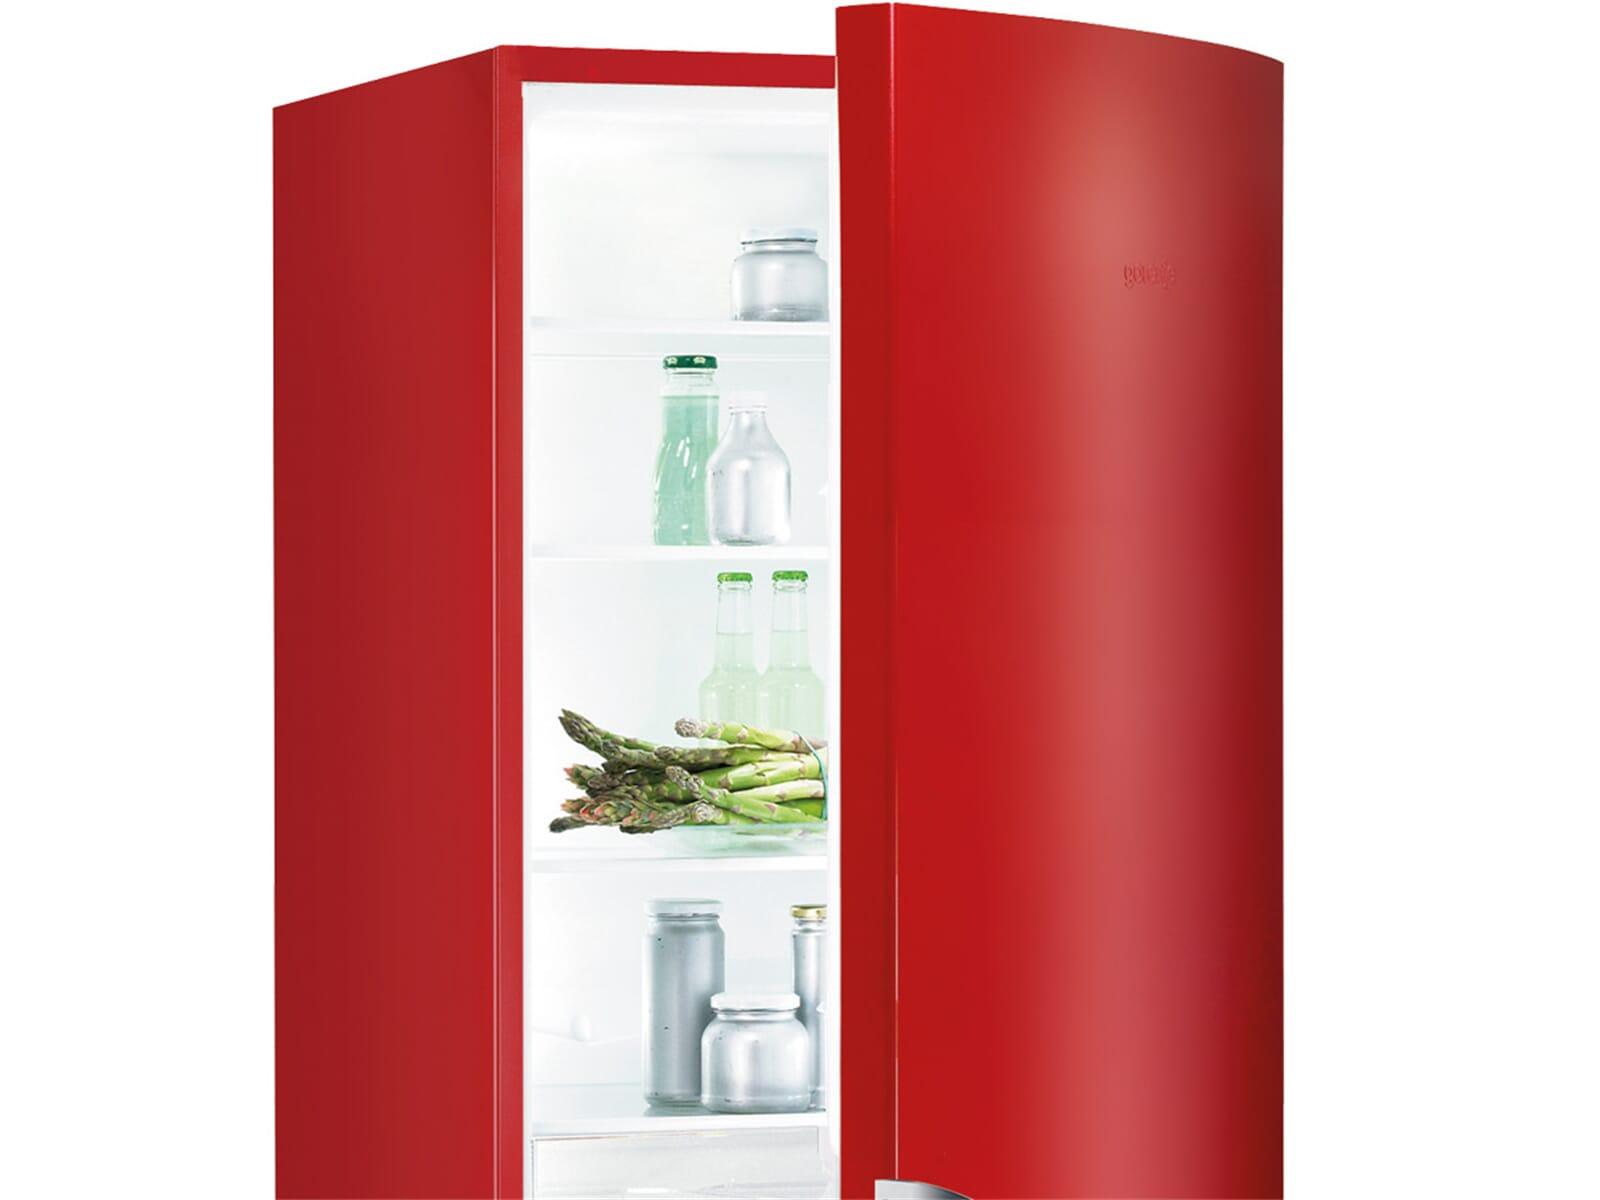 Gorenje Kühlschrank Rk 61620 X : Gorenje rk rd kühl gefrierkombination rot